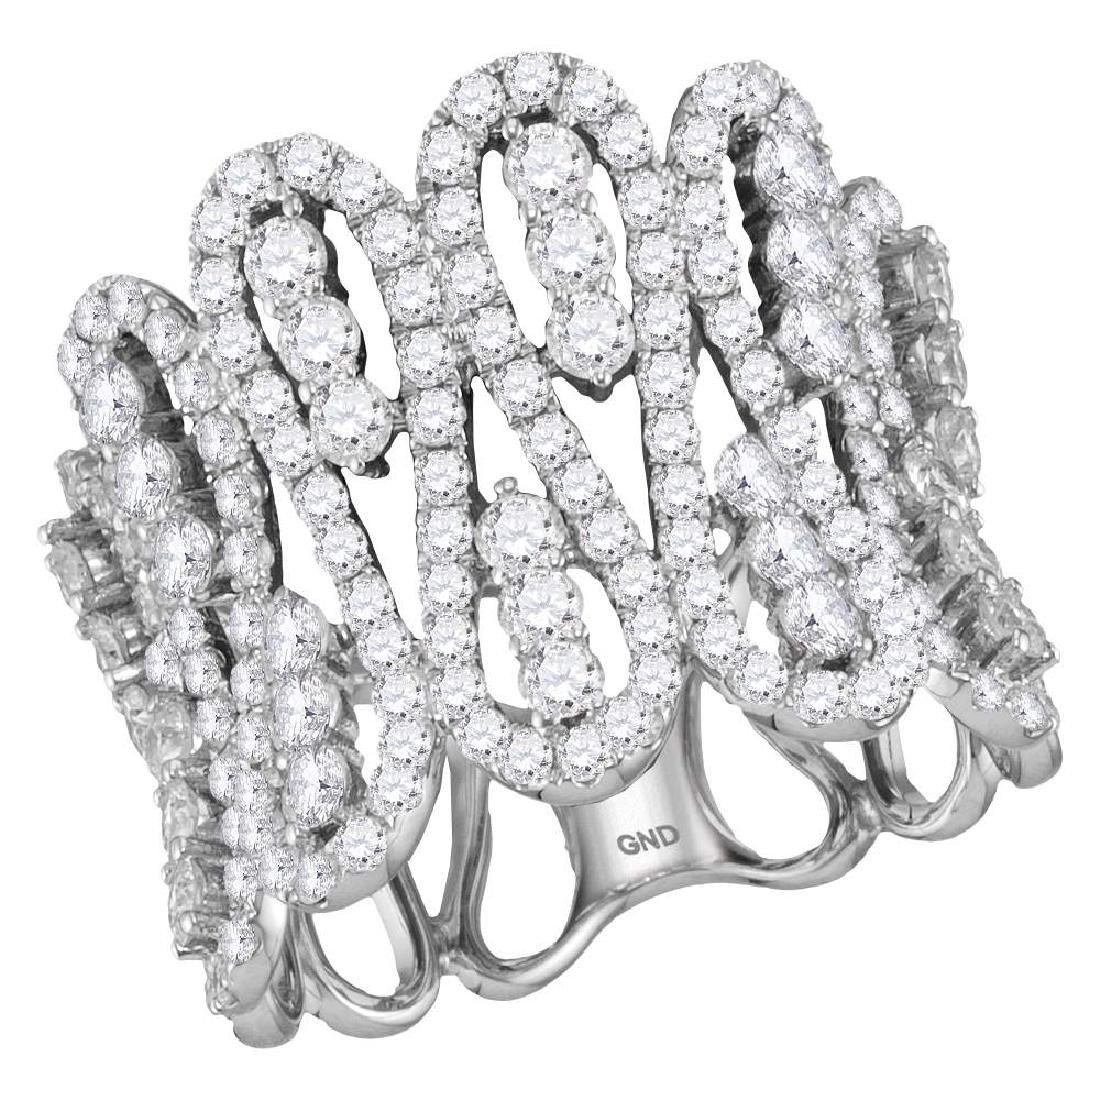 2.5 CTW Diamond Fashion Cocktail Ring 10KT White Gold -